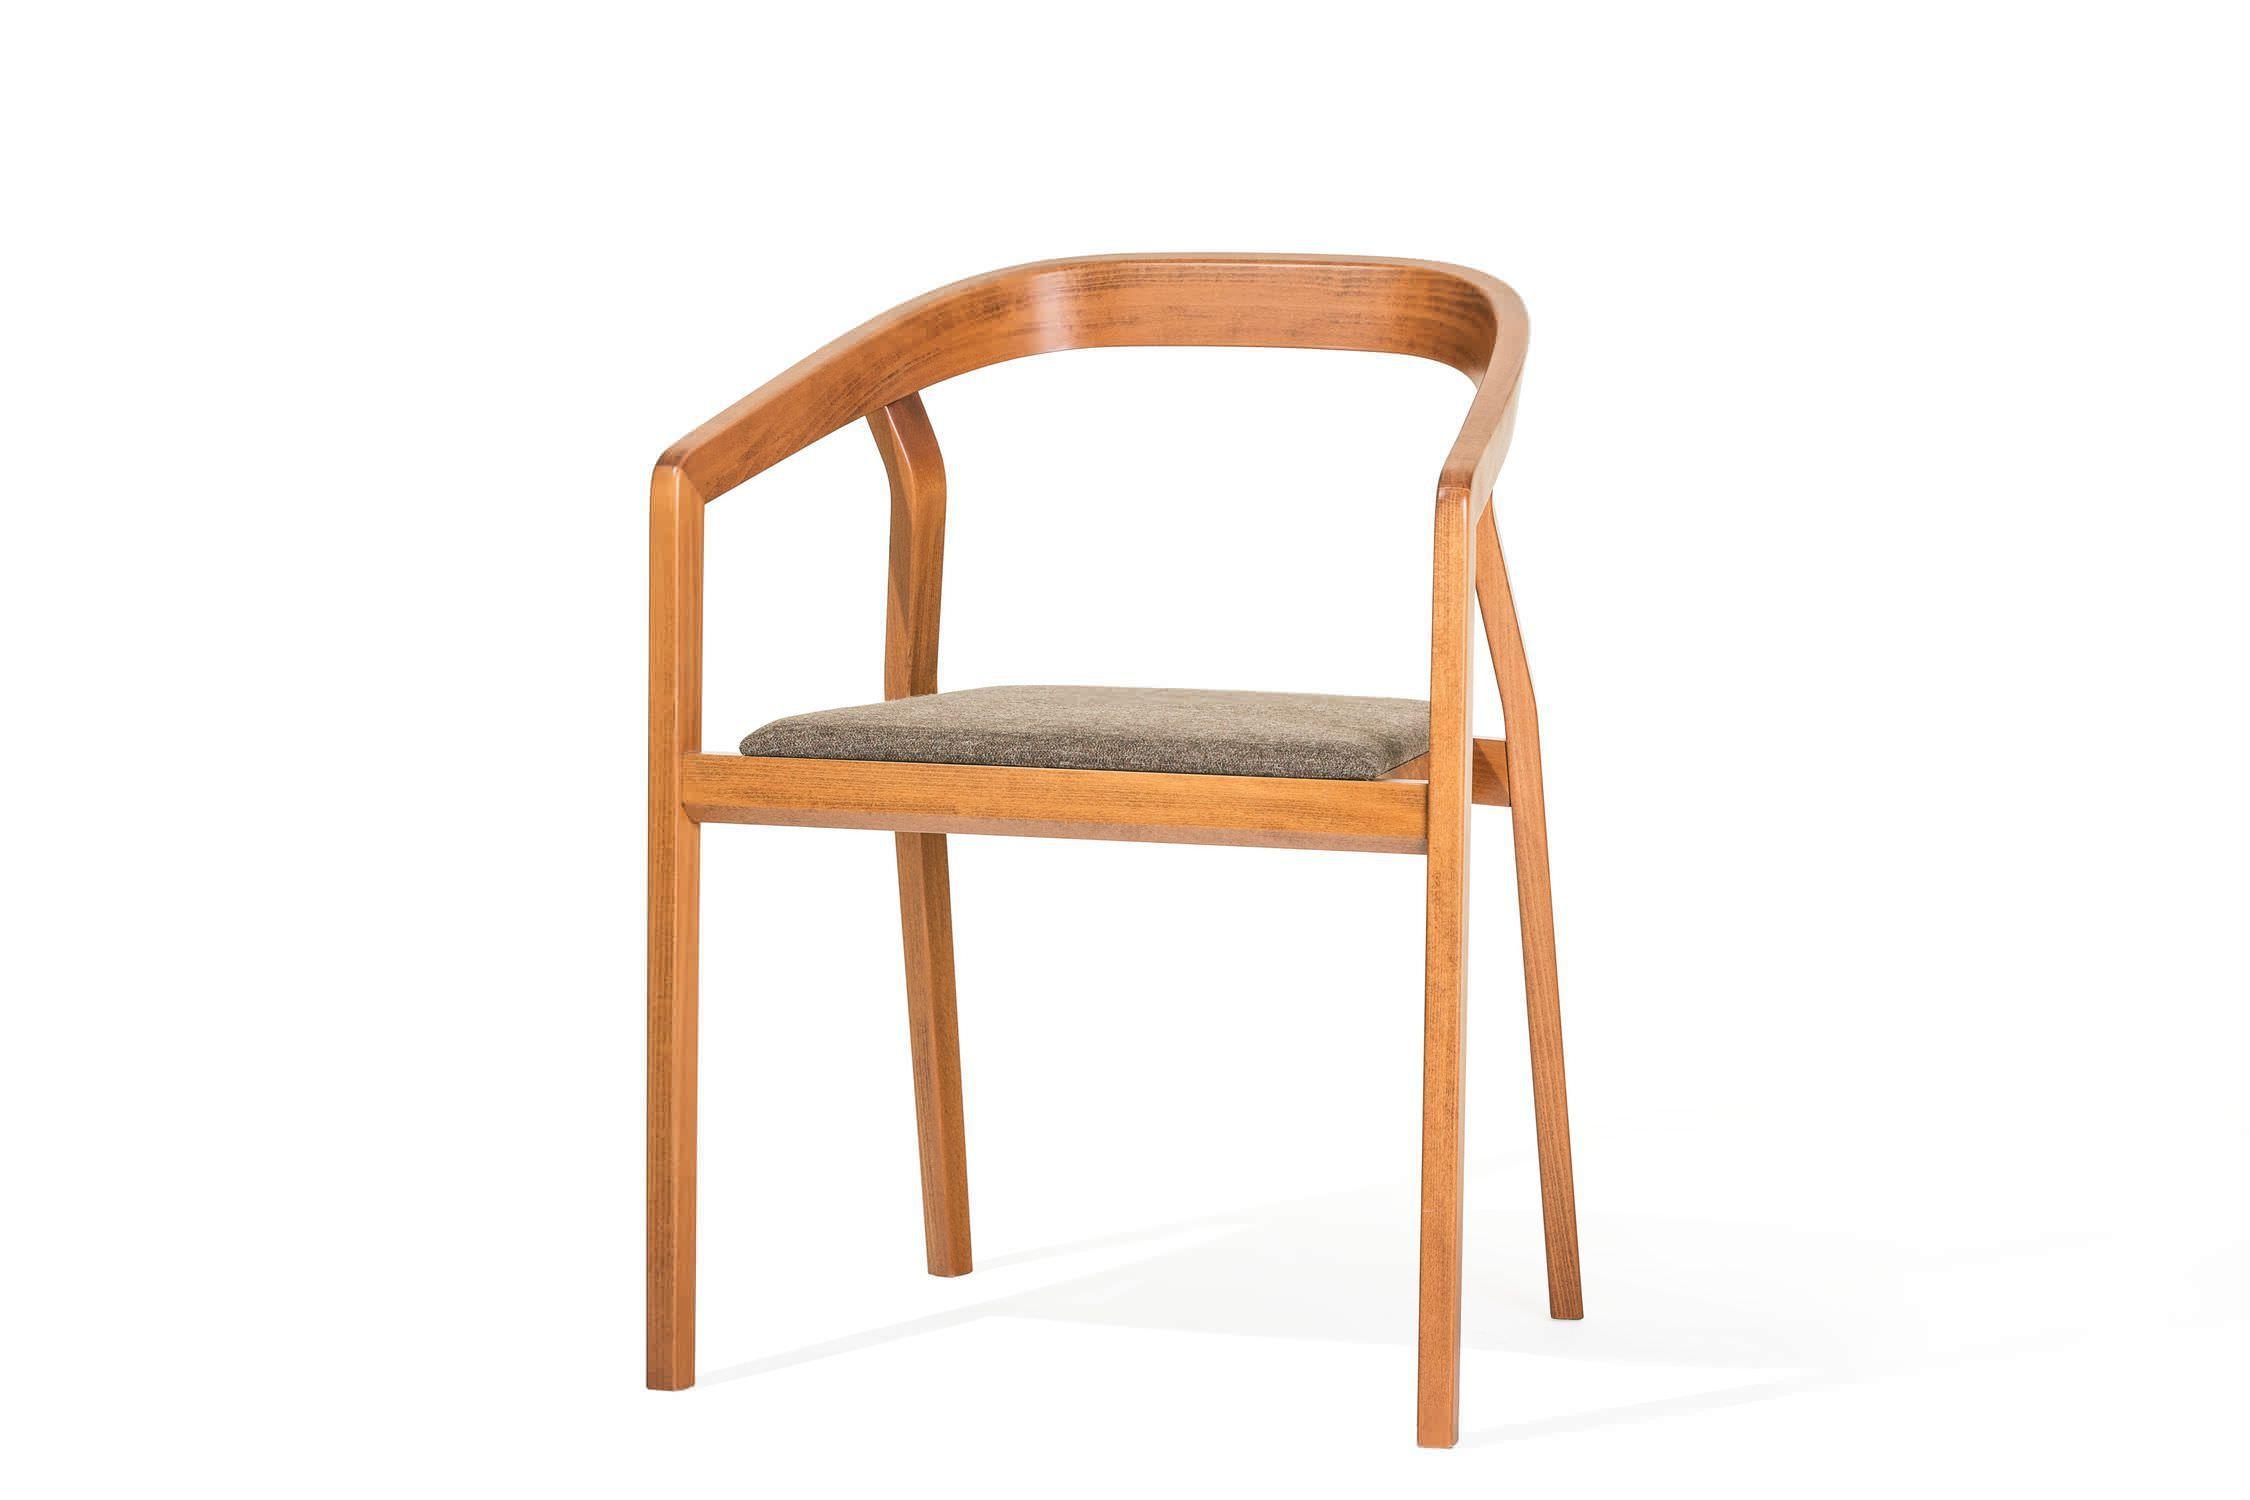 Billig Stuhl Mit Armlehne Holz Stuhle Pinterest Stuhle Stuhl